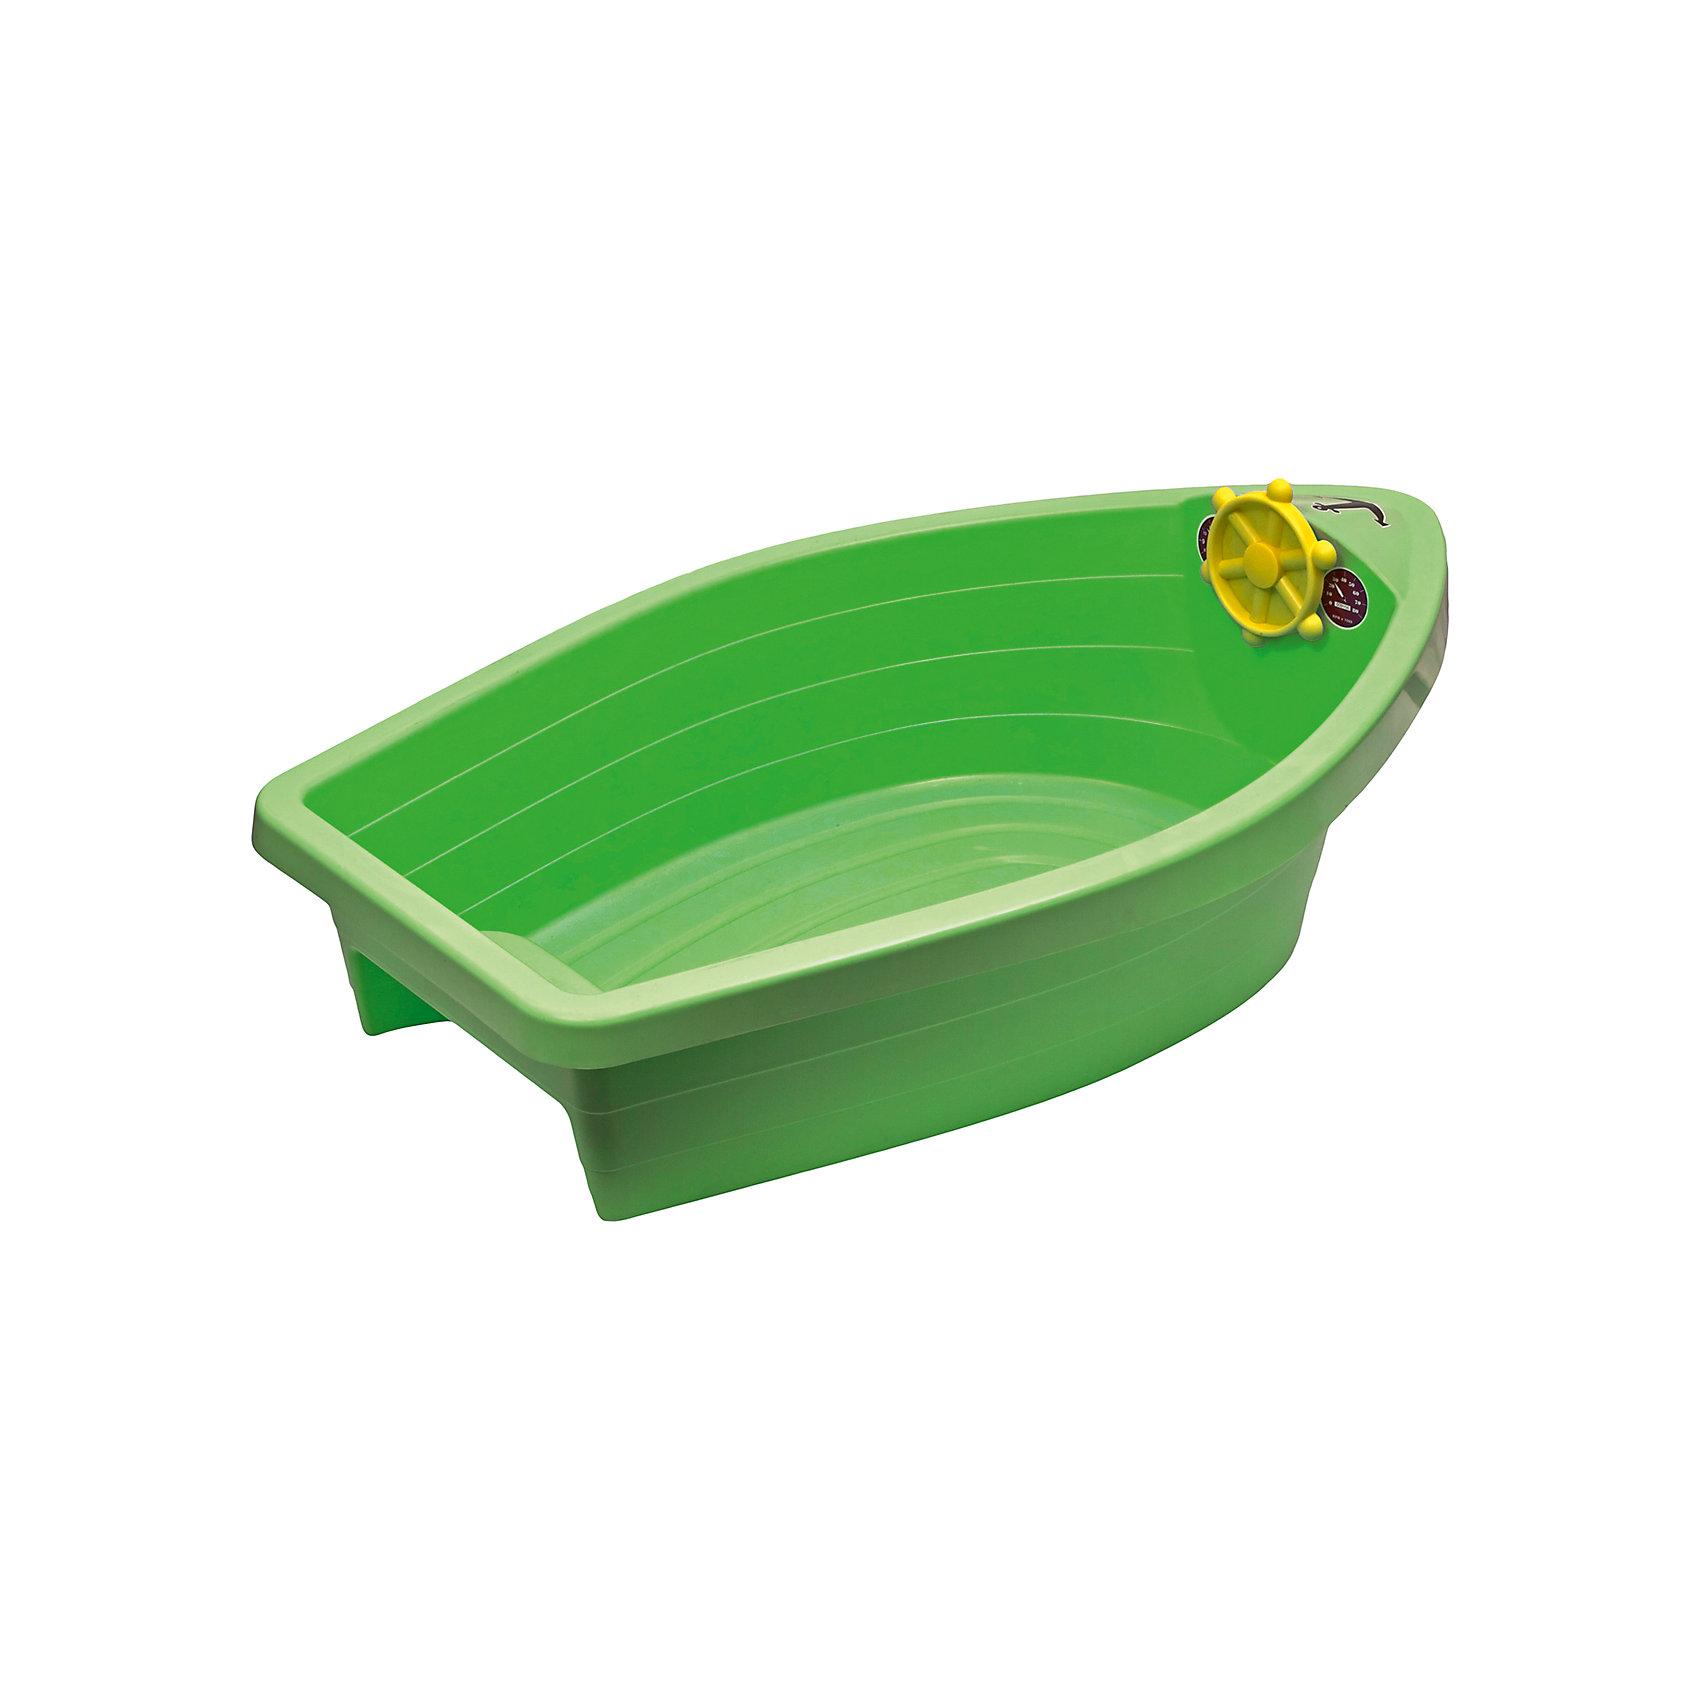 Marianplast Бассейн - Лодочка, Marian Plast, зеленая marian plast бассейн песочница собачка с крышкой